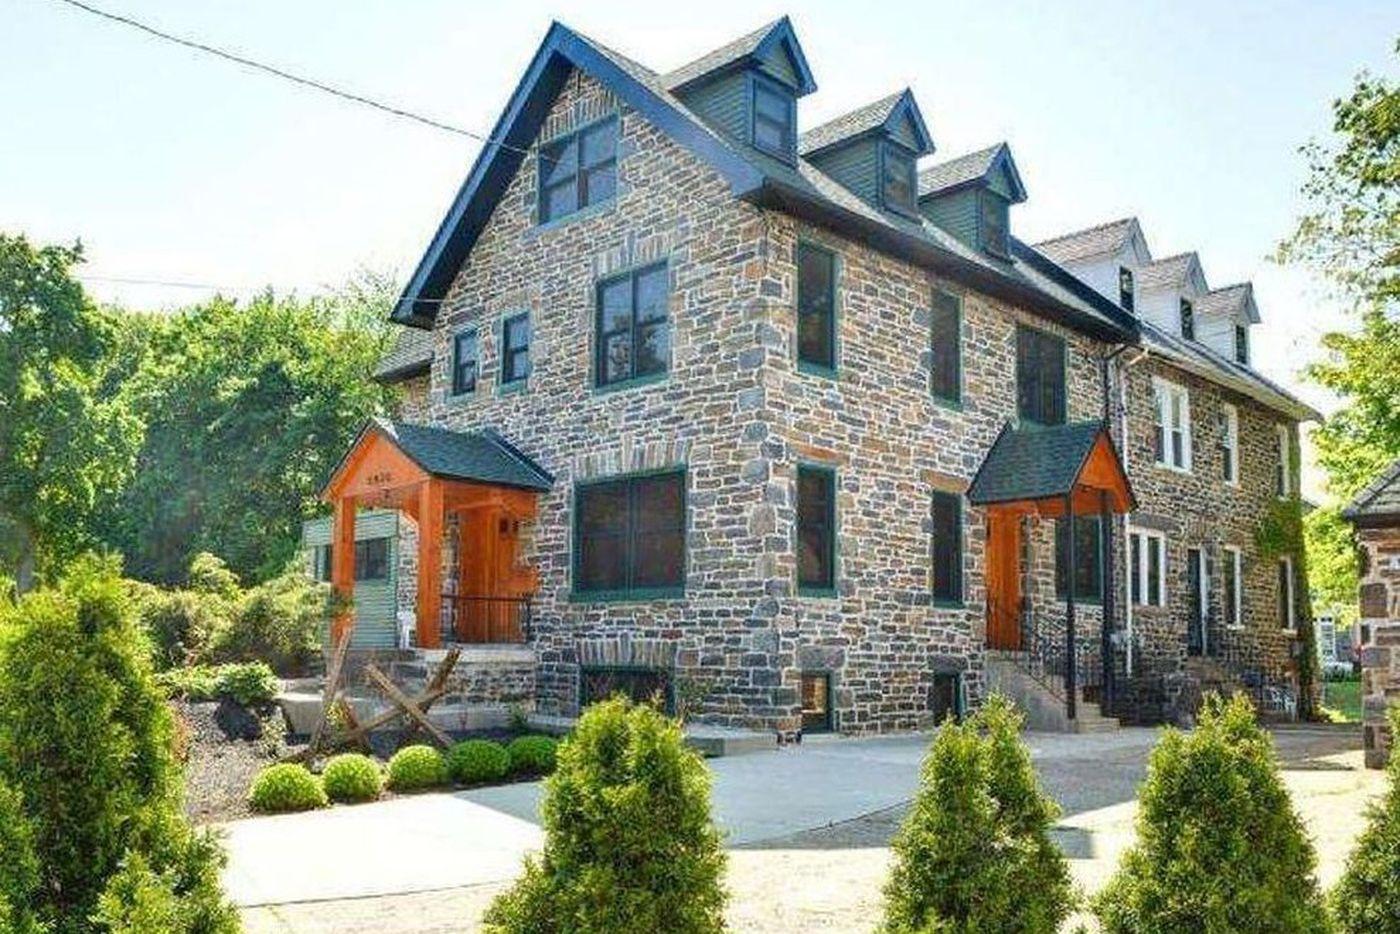 Three single-family rental houses among Philadelphia's priciest